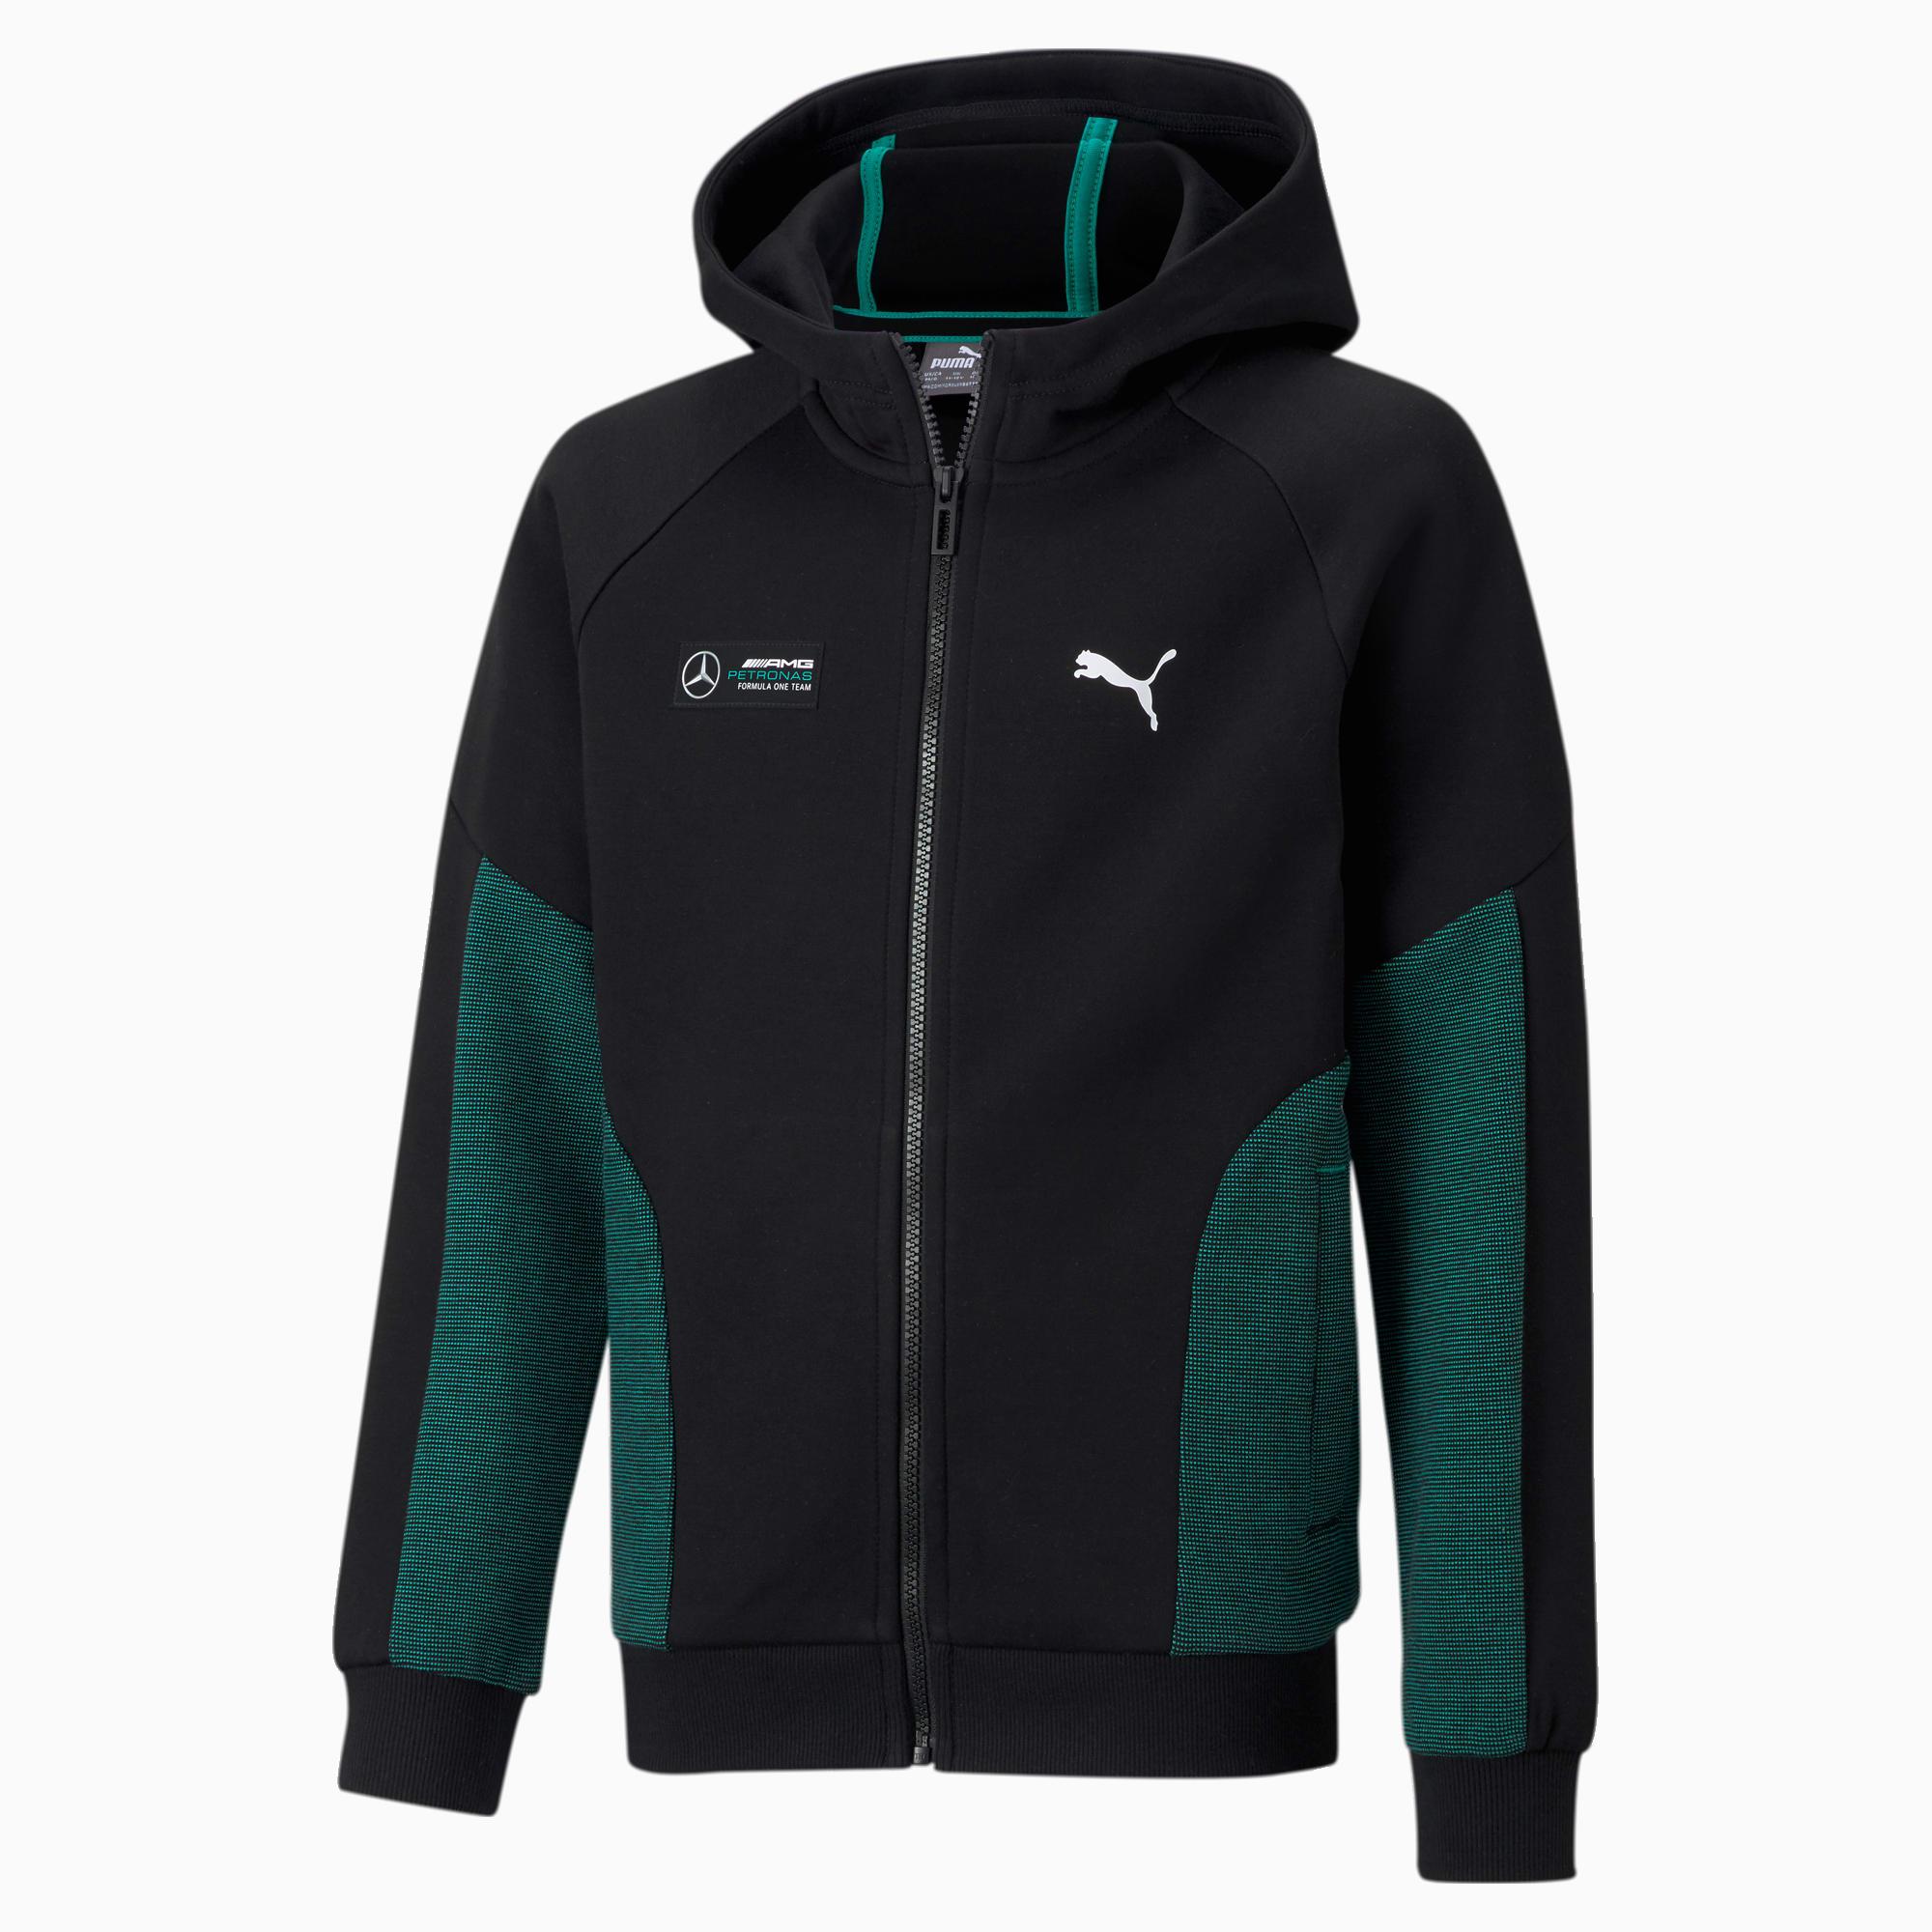 Mercedes F1 Hooded Youth Sweat Jacket | Puma Black | PUMA Back to ...